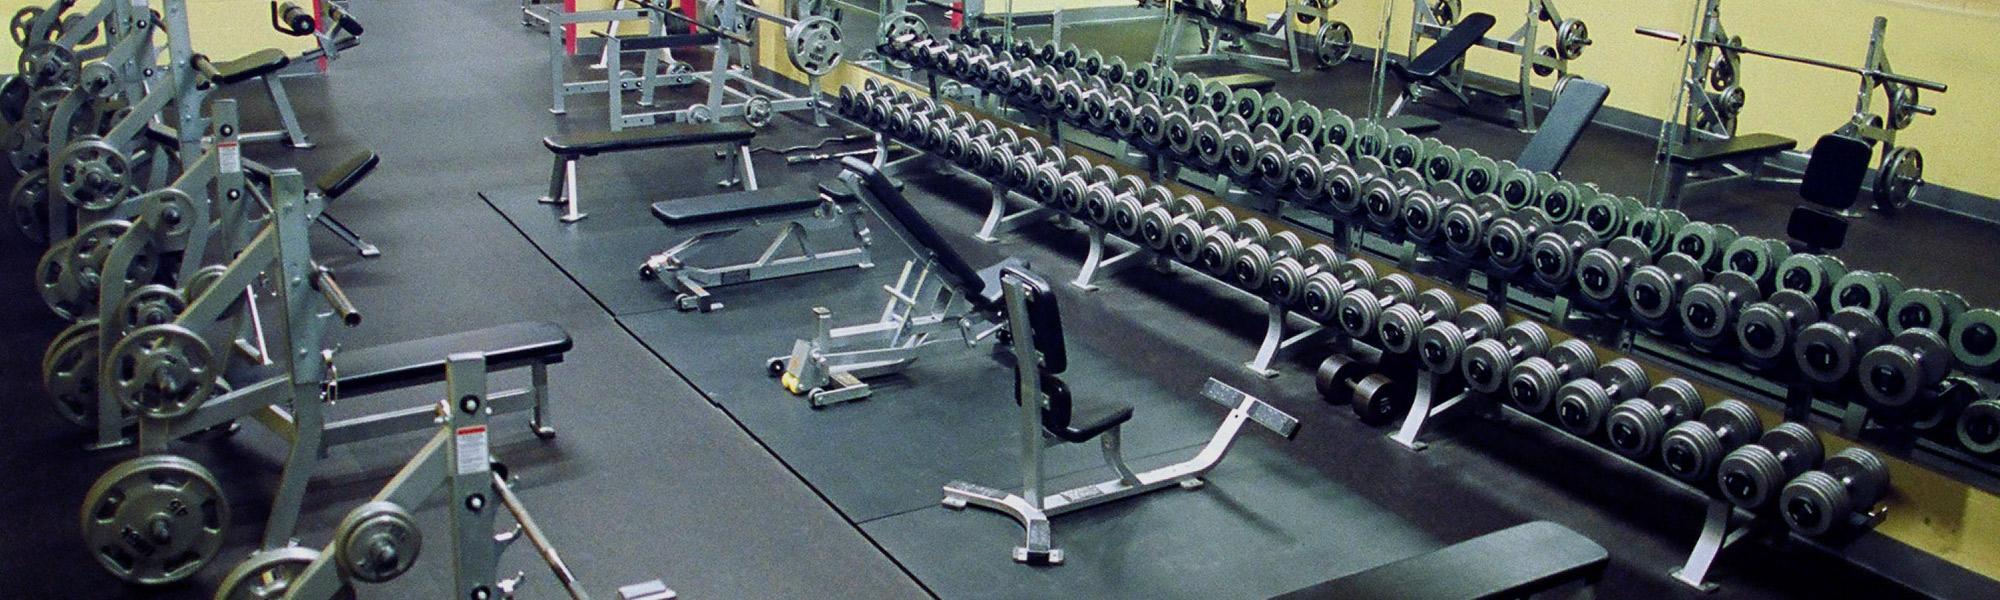 Myrtle Beach Fitness Center